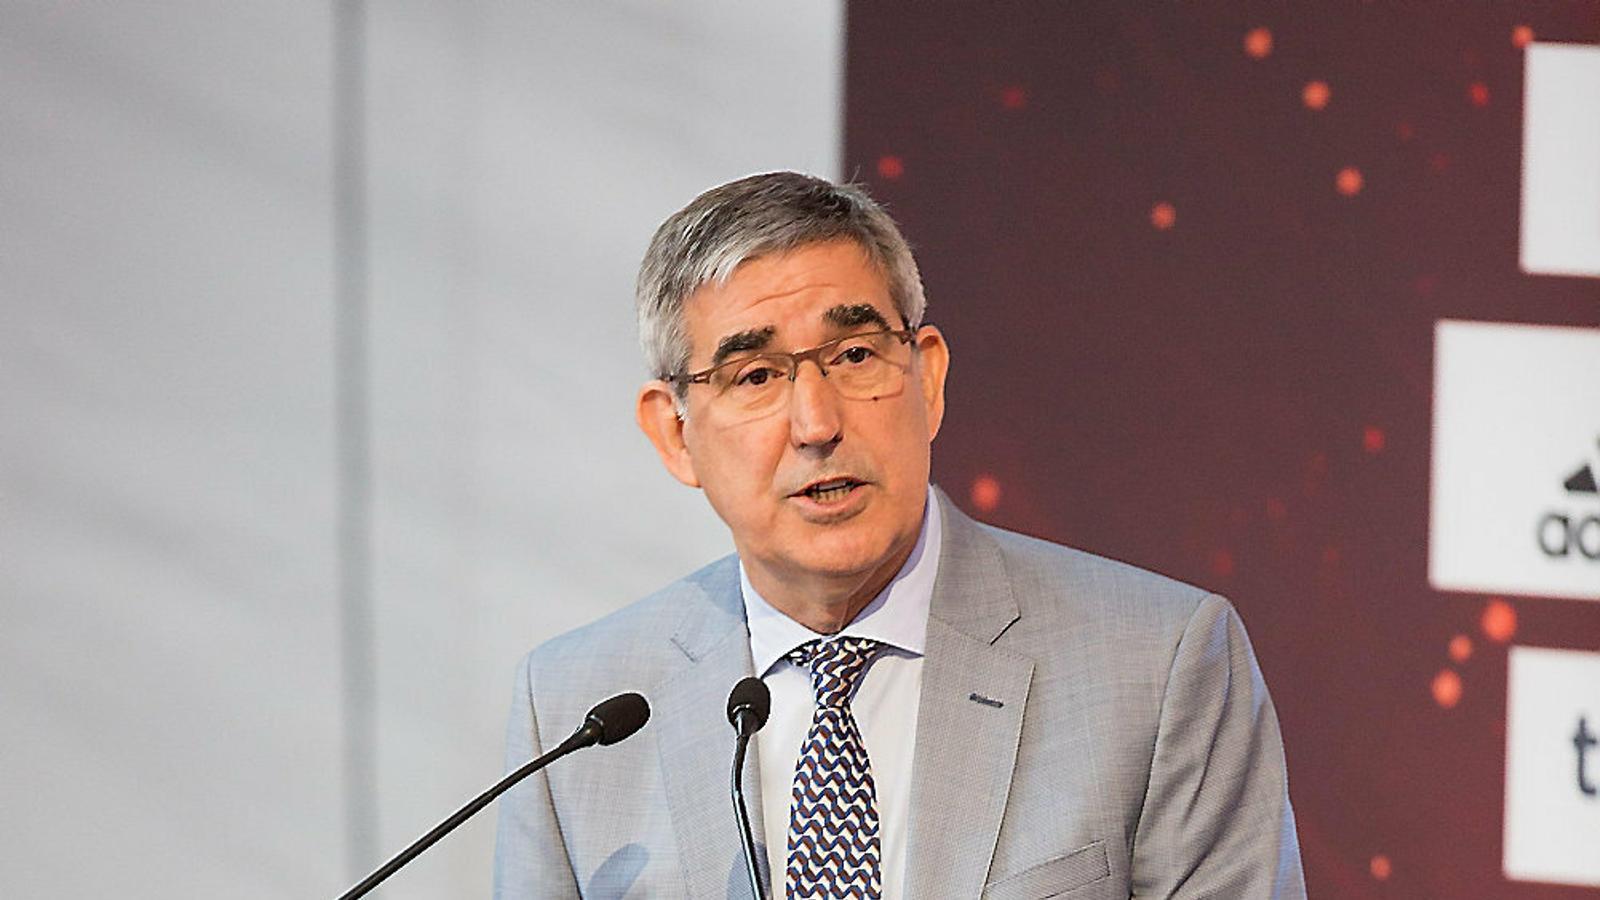 Jordi Bertomeu, president executiu de l'Eurolliga, durant l'acte inaugural.